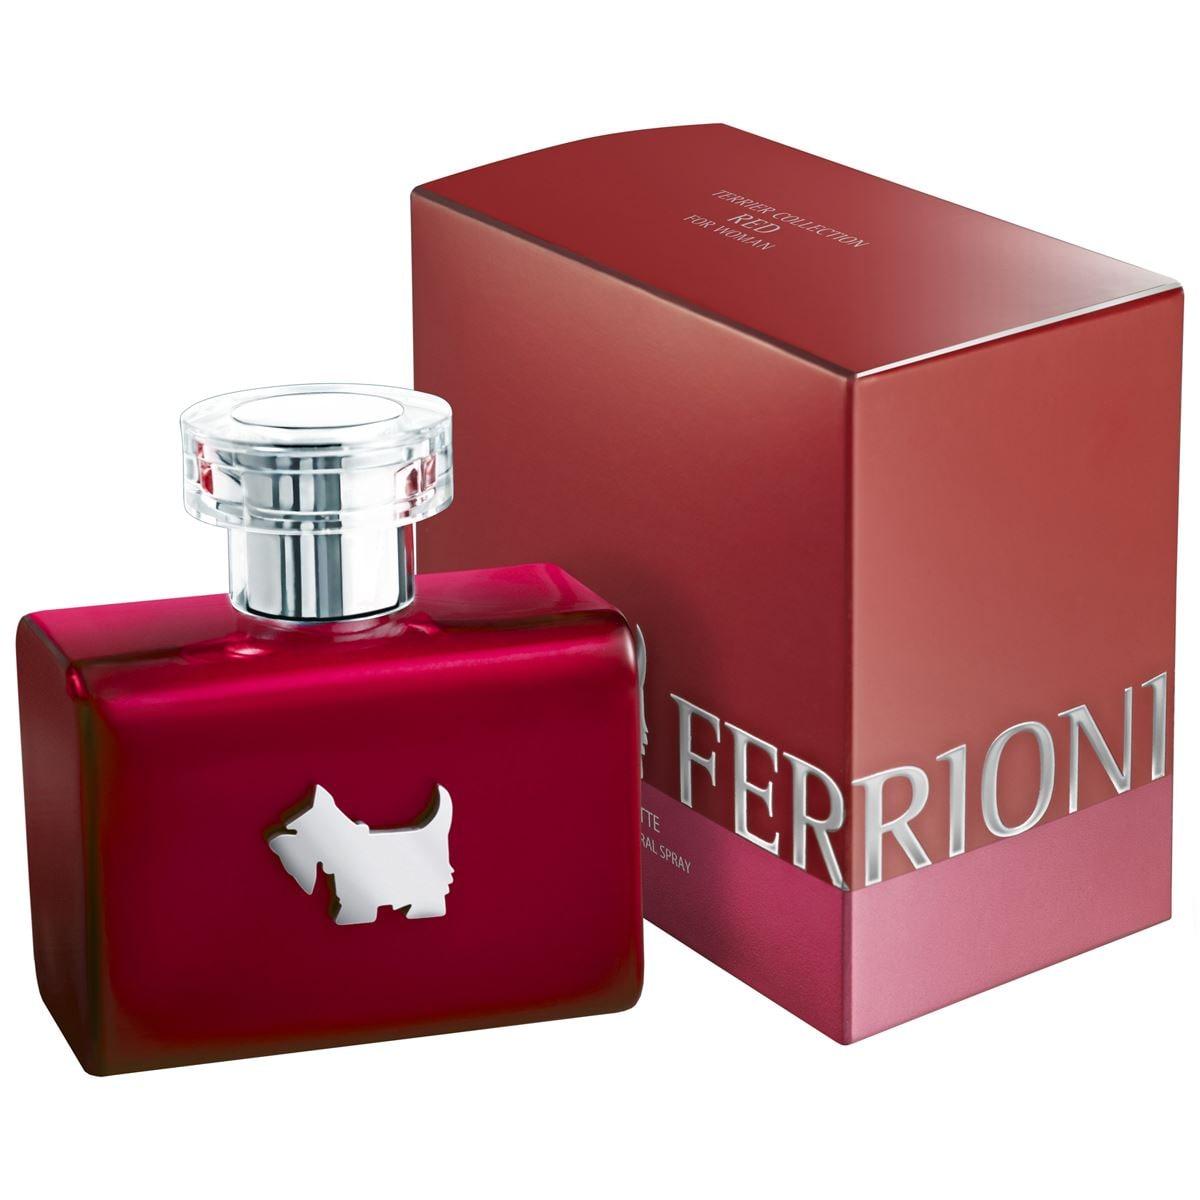 Fragancia Para Dama Terrier Collection Red for Woman de Ferrioni